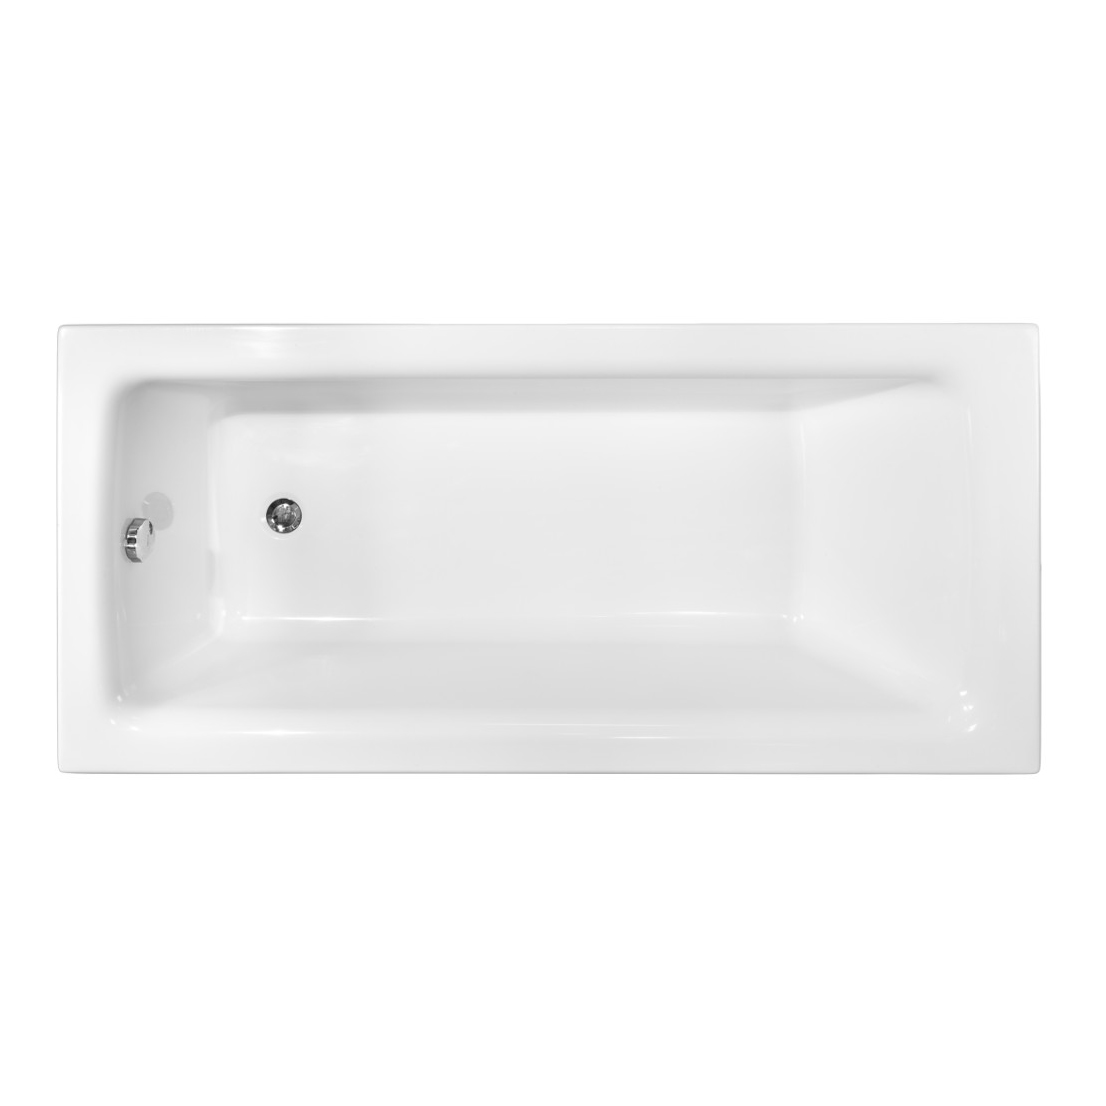 Акриловая ванна Besco Talia 170x75 цены онлайн